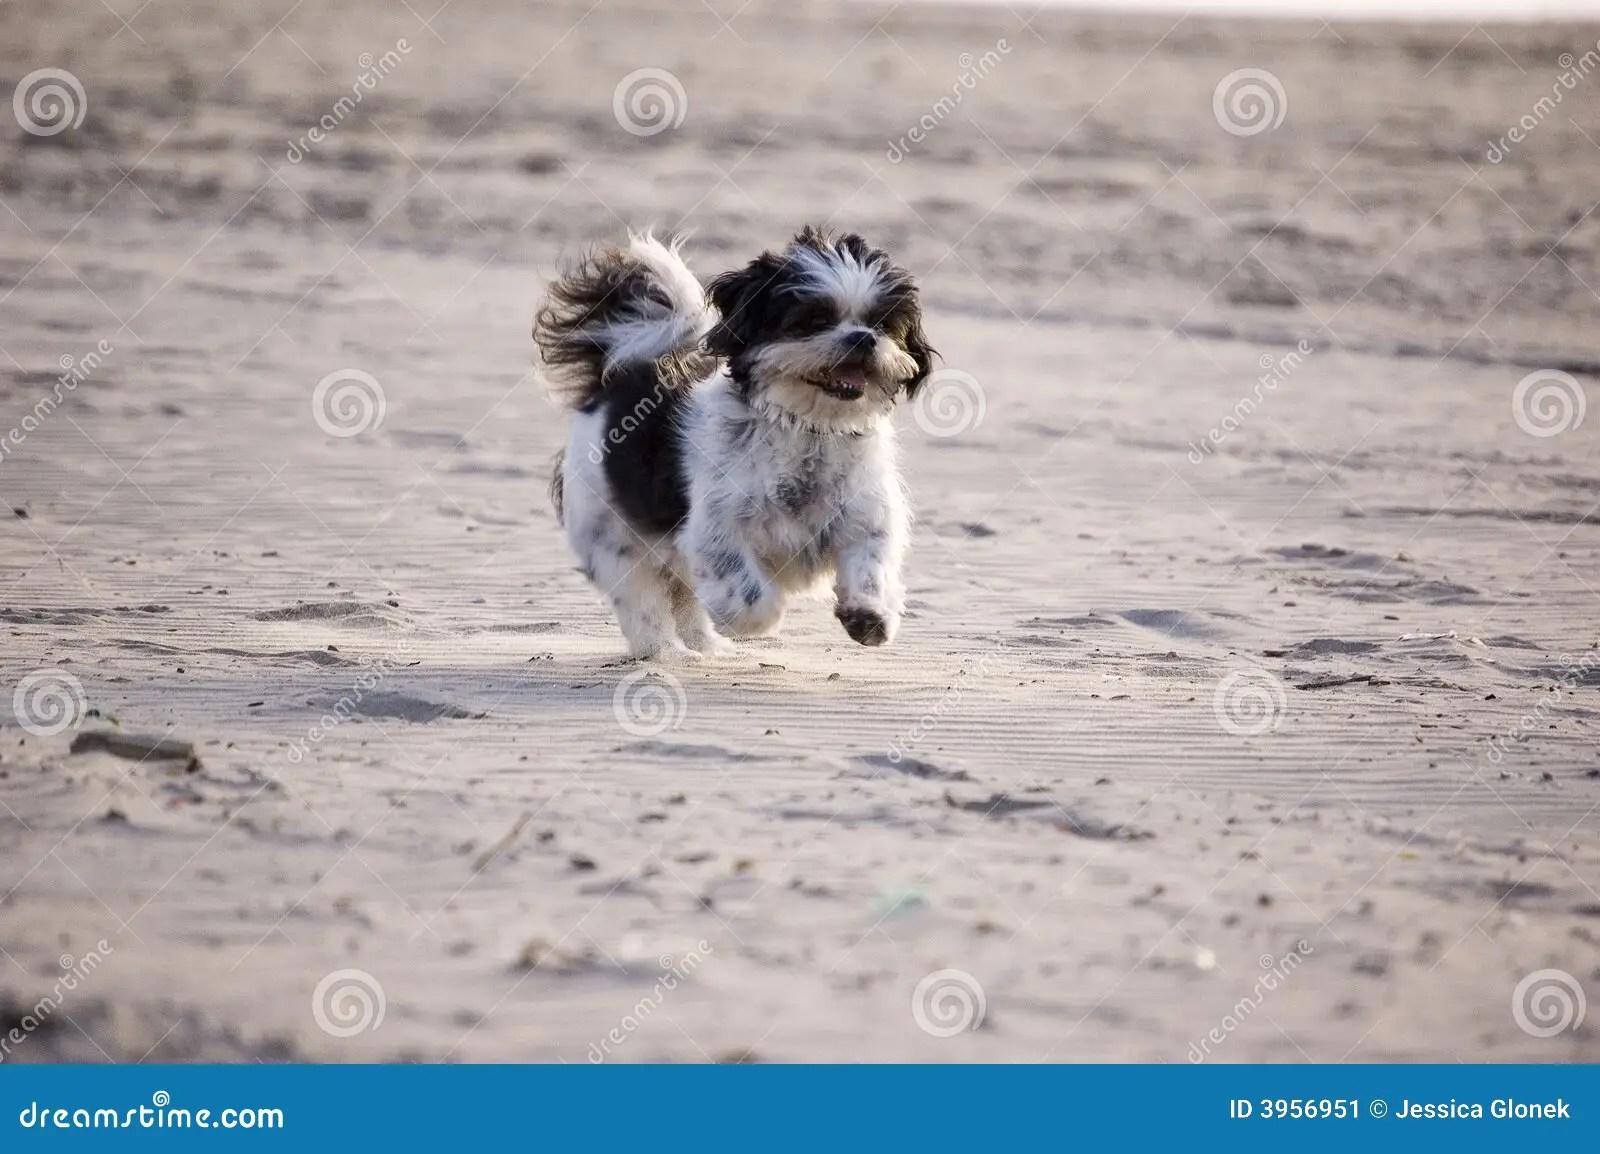 Owner Running Tzu Shih